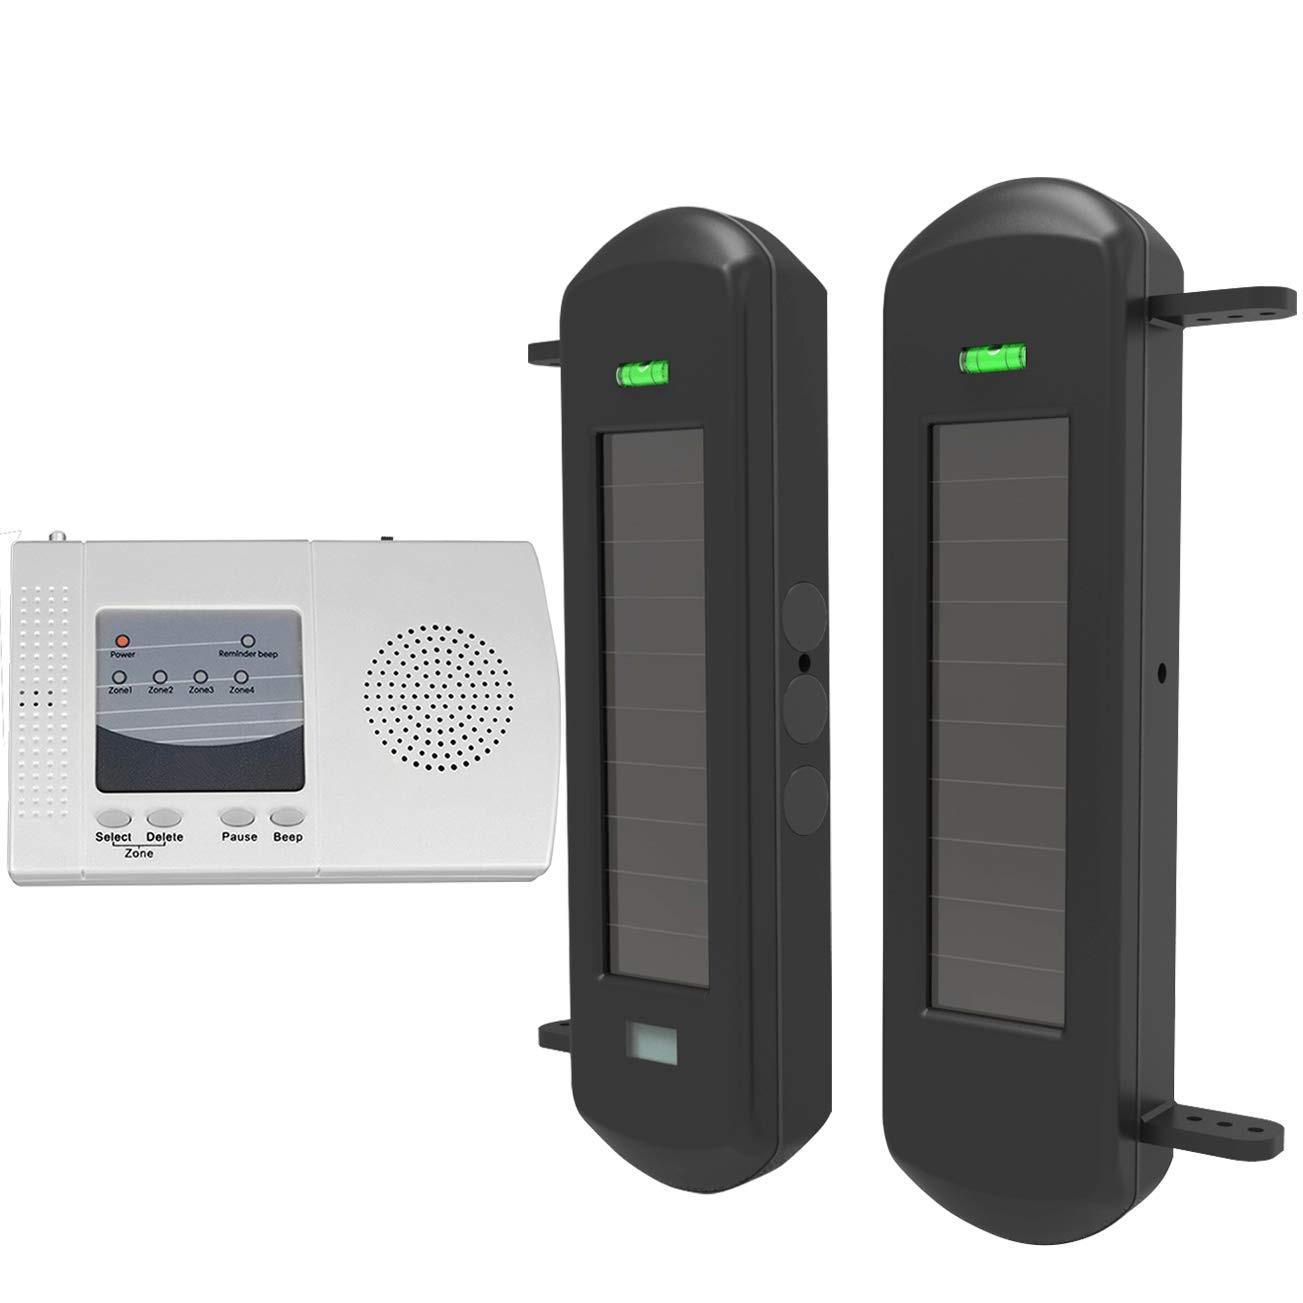 Solar Wireless Driveway Alarm System-1/2 Mile Long Transmission Range-300 Feet Wide Sensor Range-No Wiring Outdoor Weatherproof